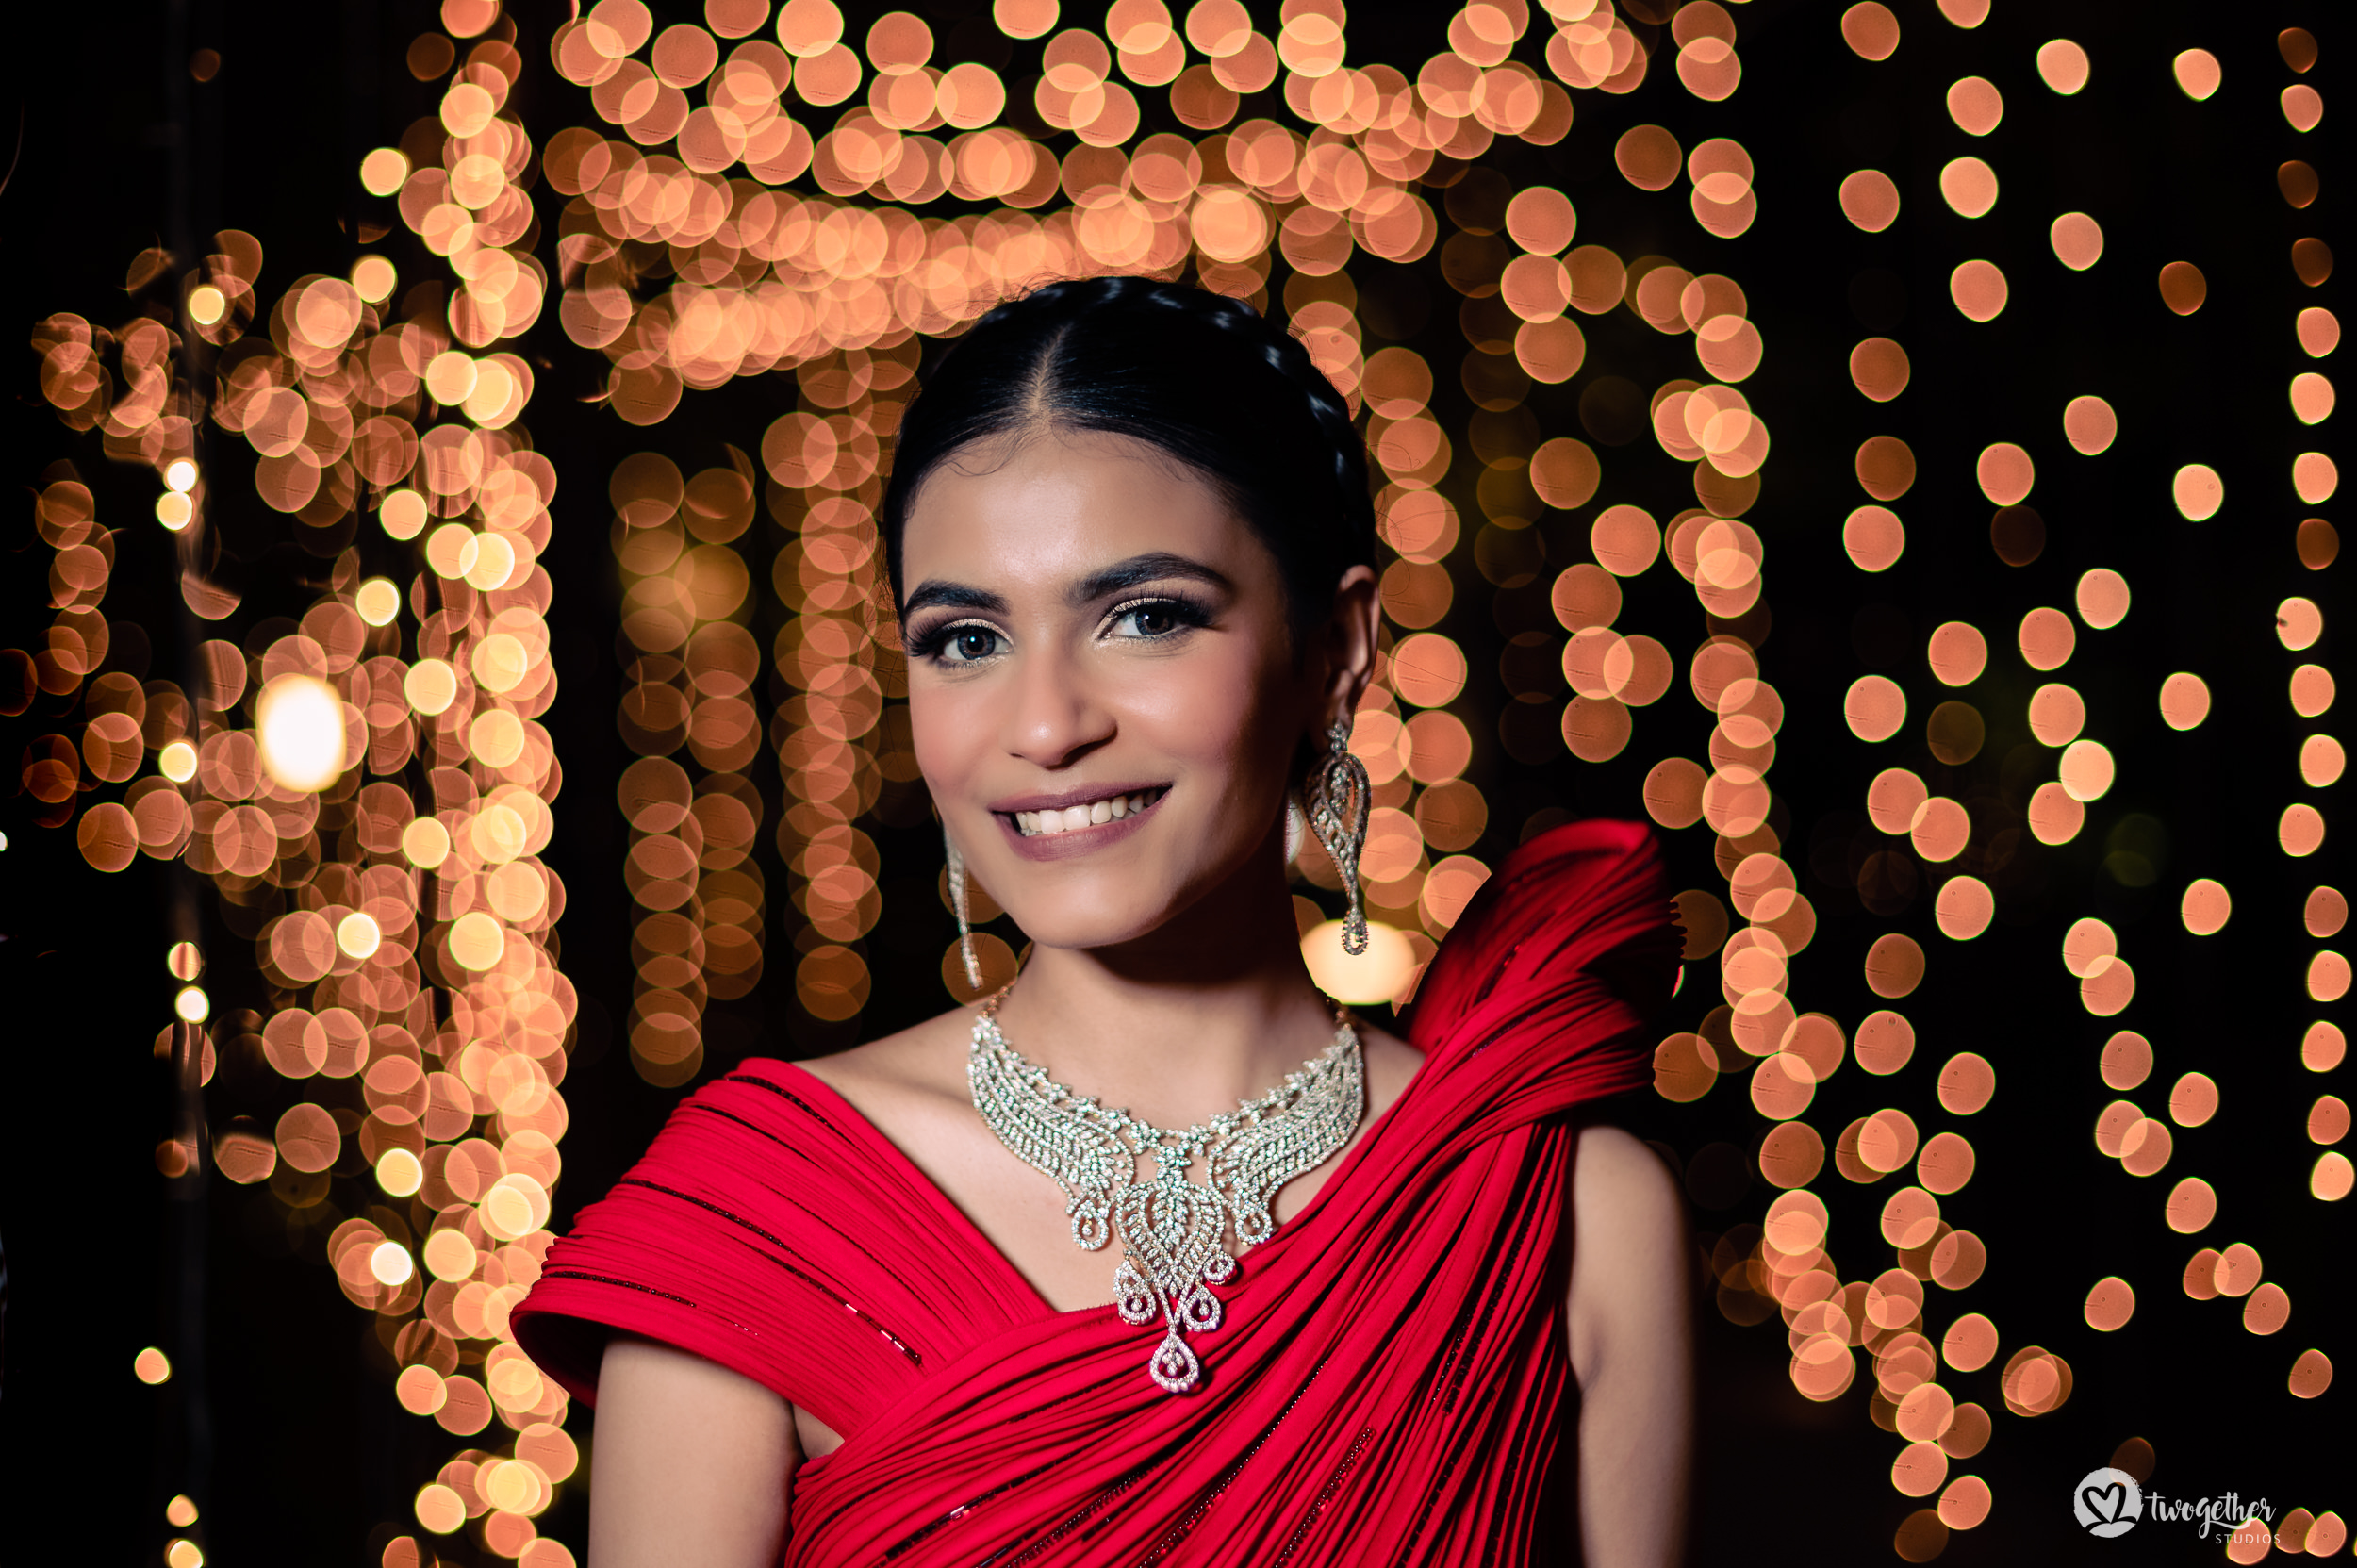 Sangeet night bride portrait at an Indian wedding in Westin Sohna.